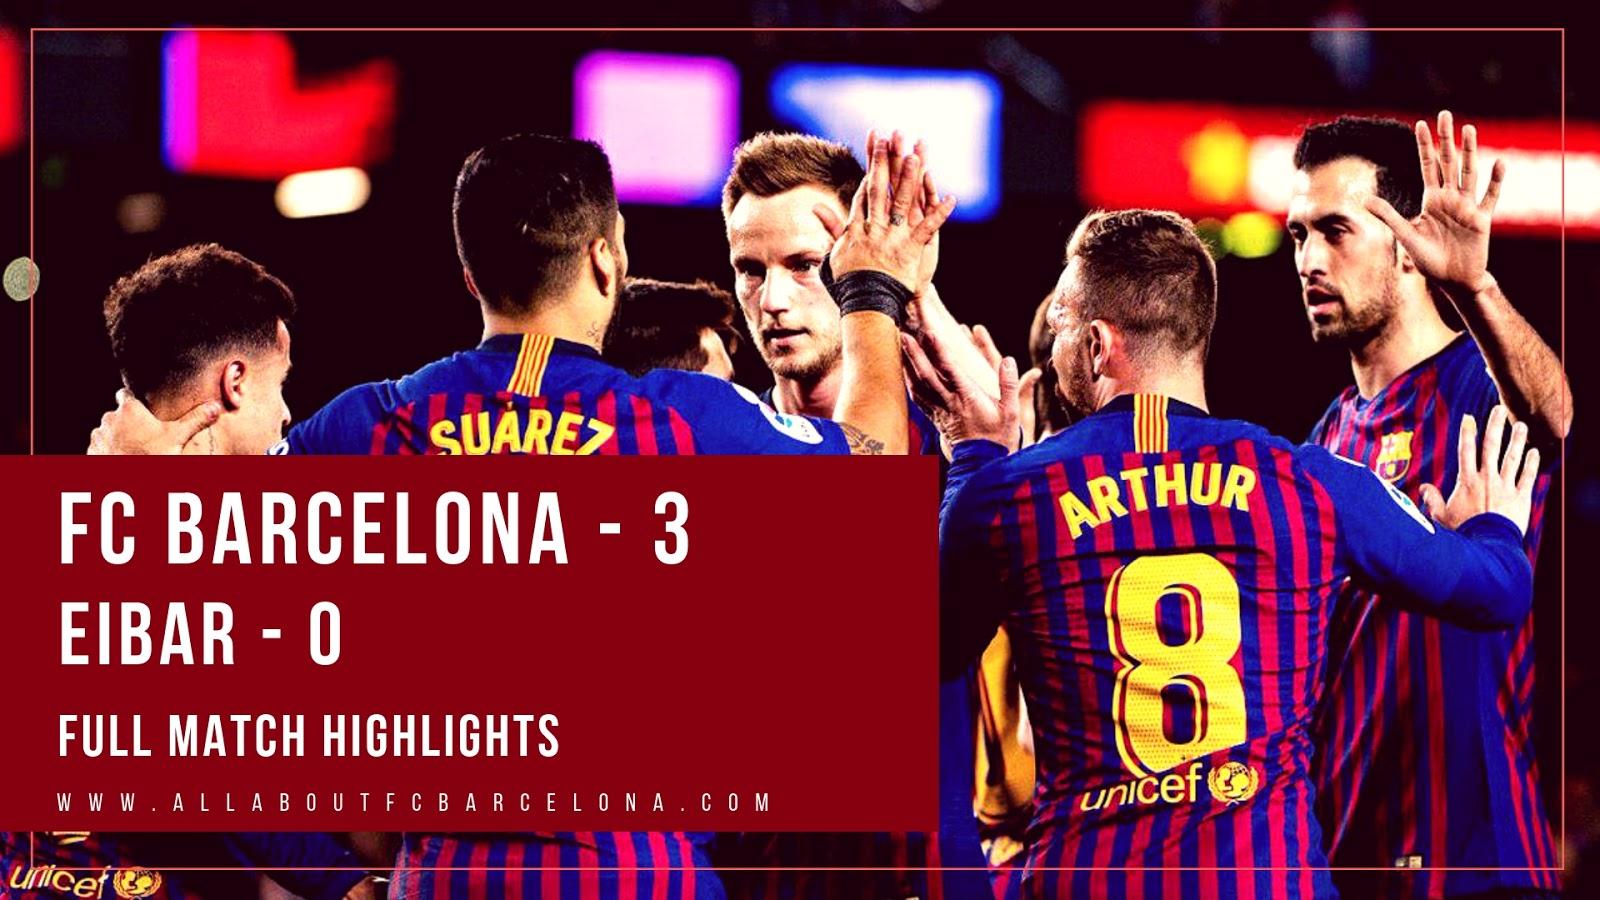 Full Match Highlights of FC Barcelona's 3-0 victory over Eibar at Camp Nou #FCBarcelona #Barca